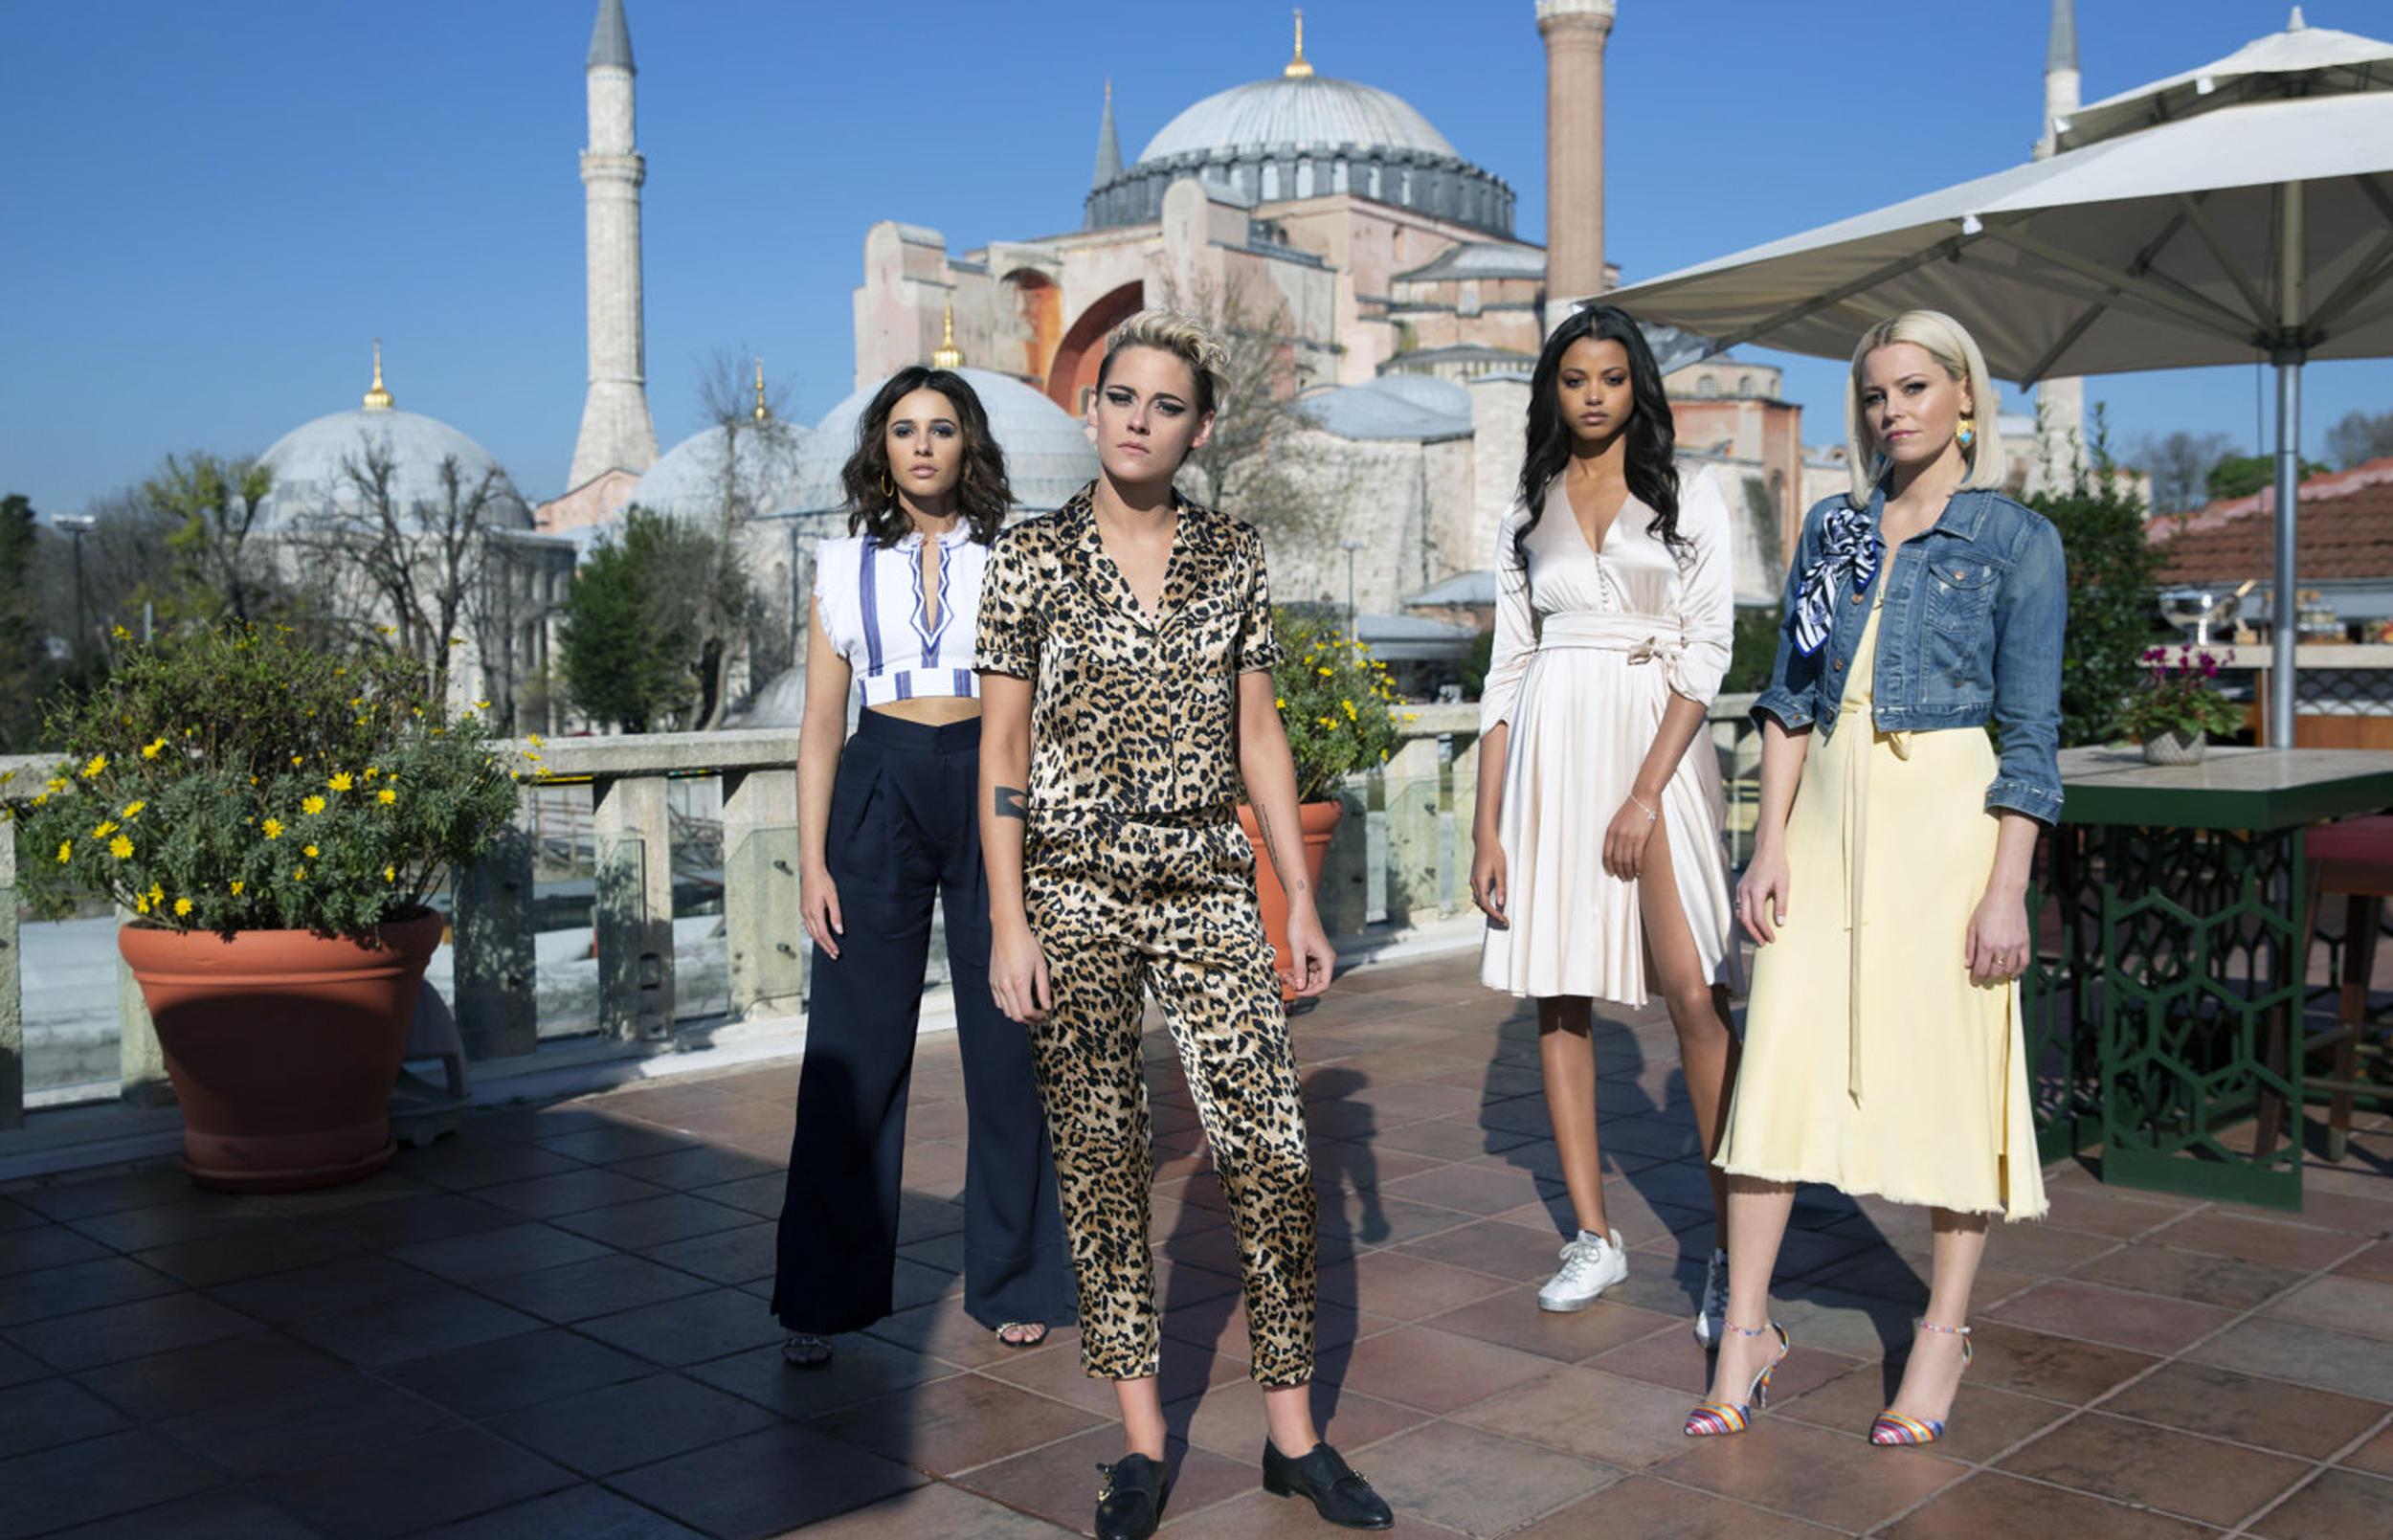 Naomi Scott, Kristen Stewart, Ella Balinska and Elizabeth Banks star in the upcoming Charlie's Angels Reboot